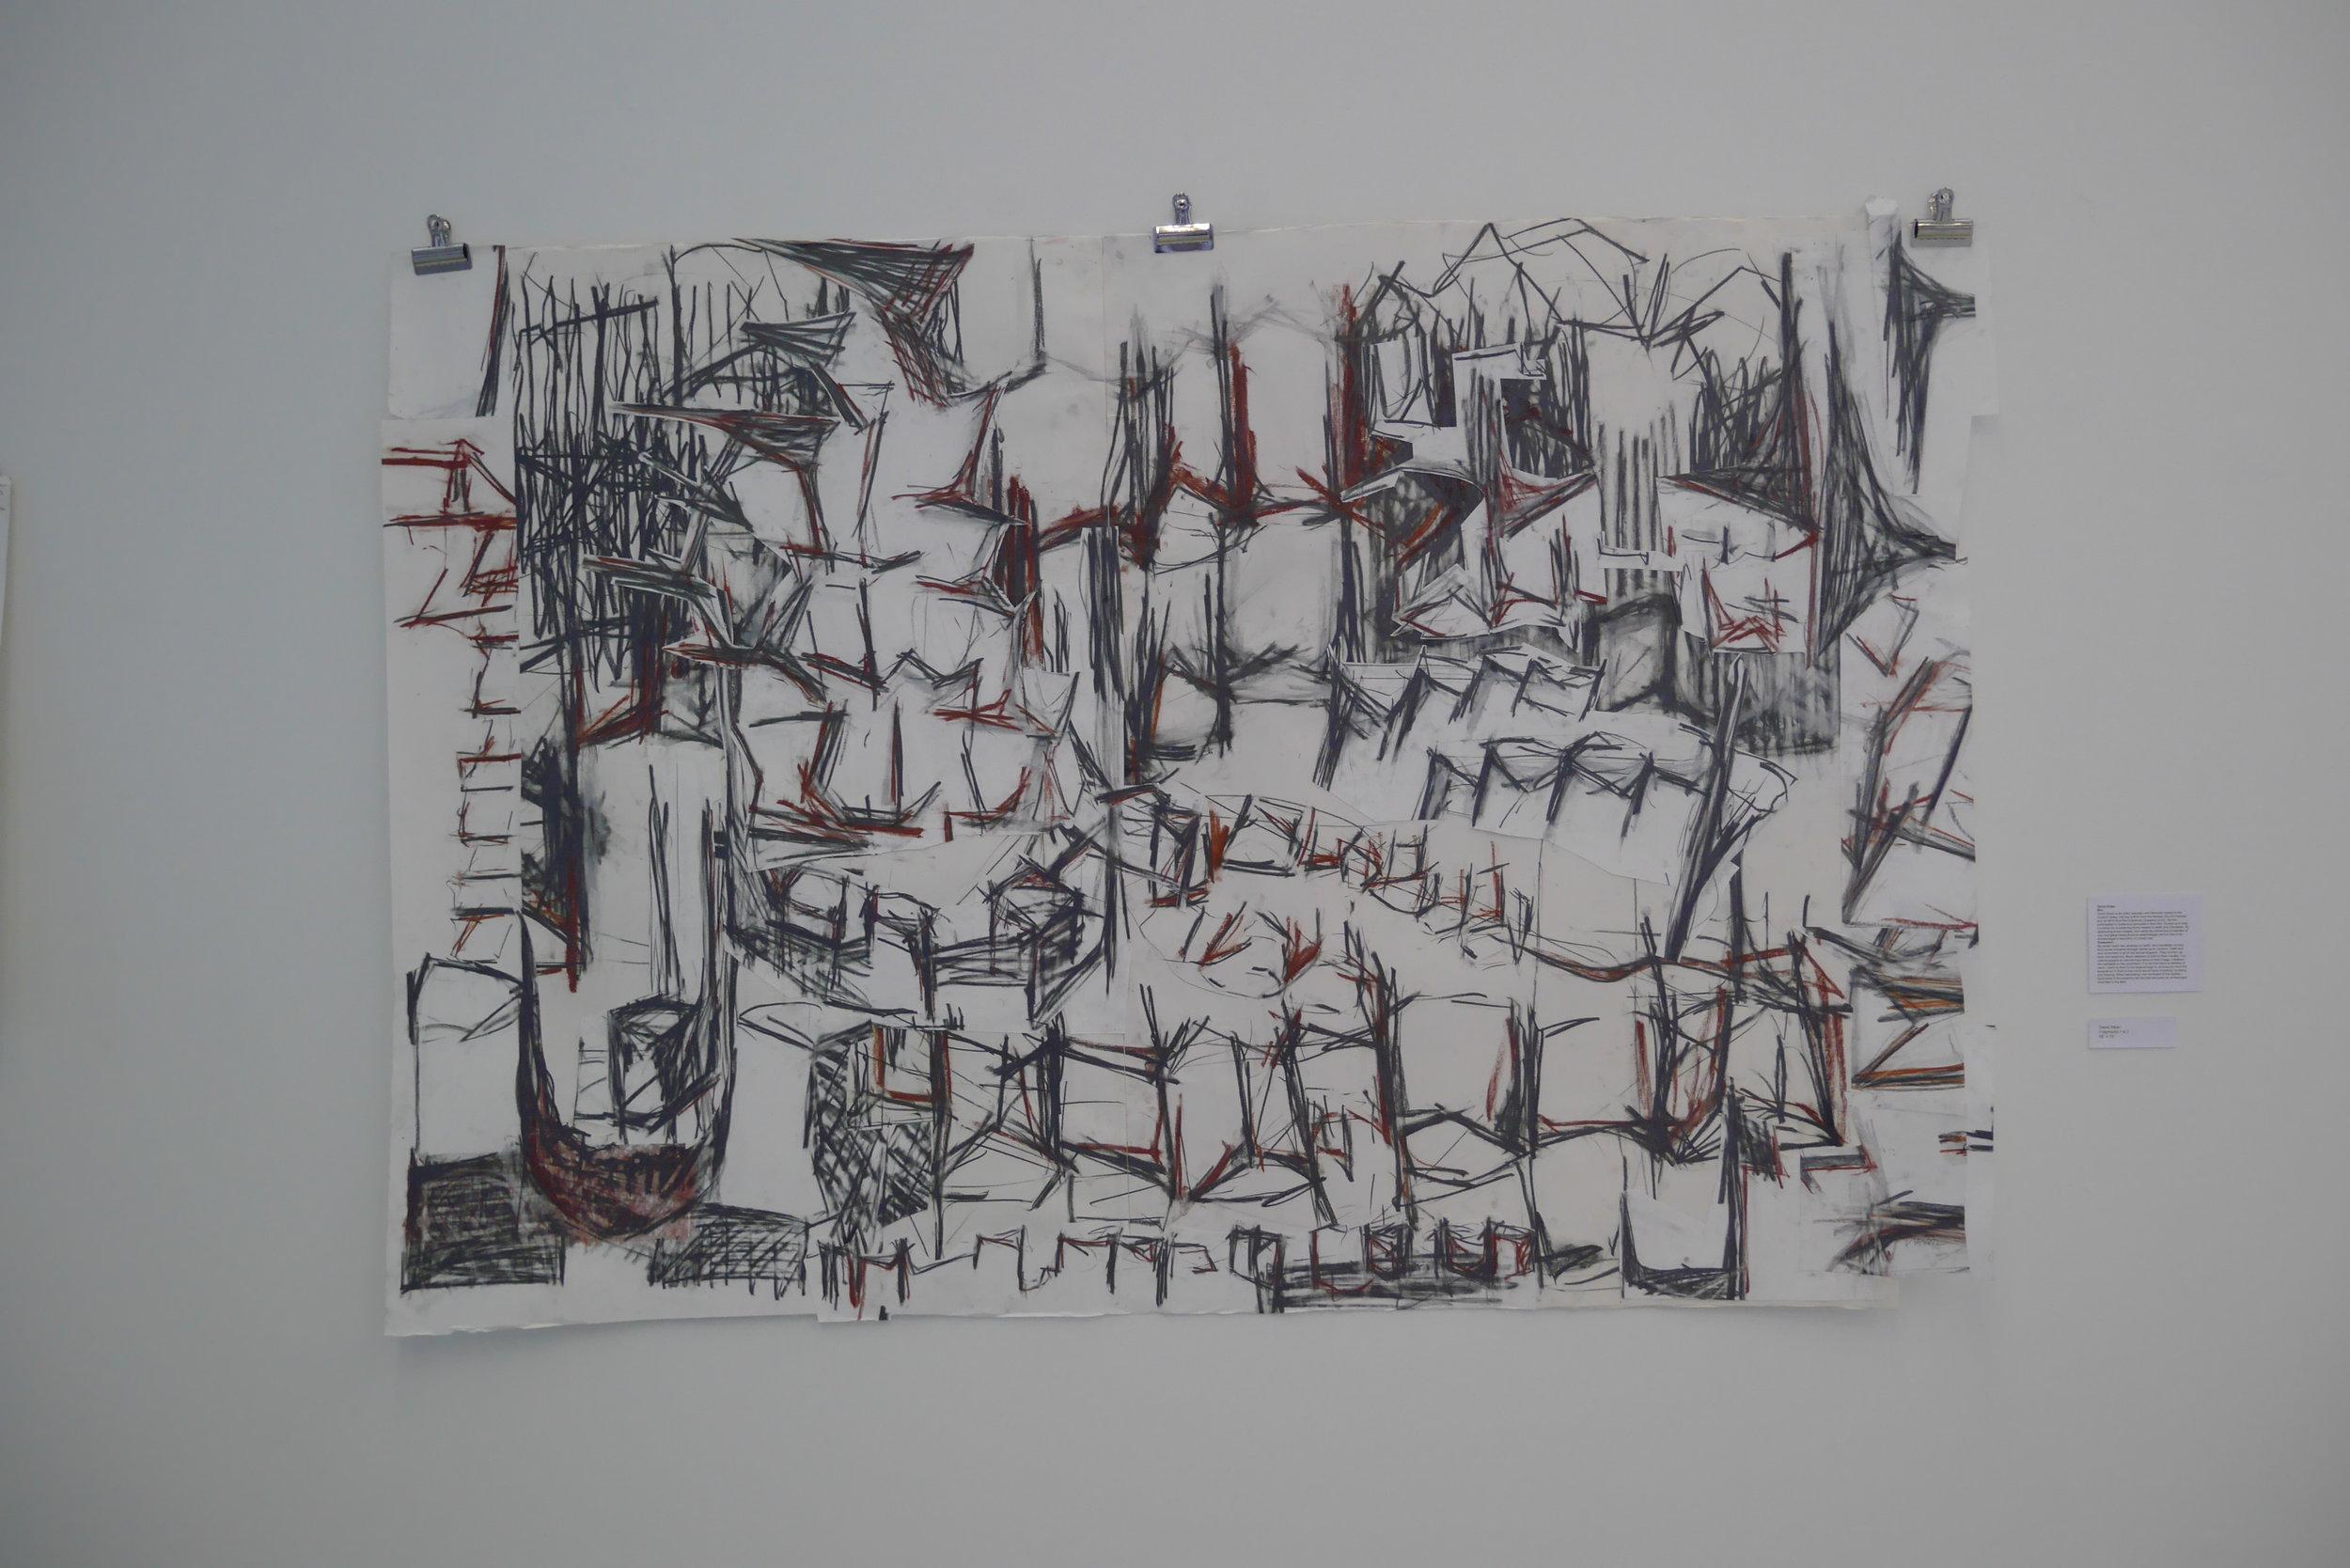 David Alban, Fragments 2